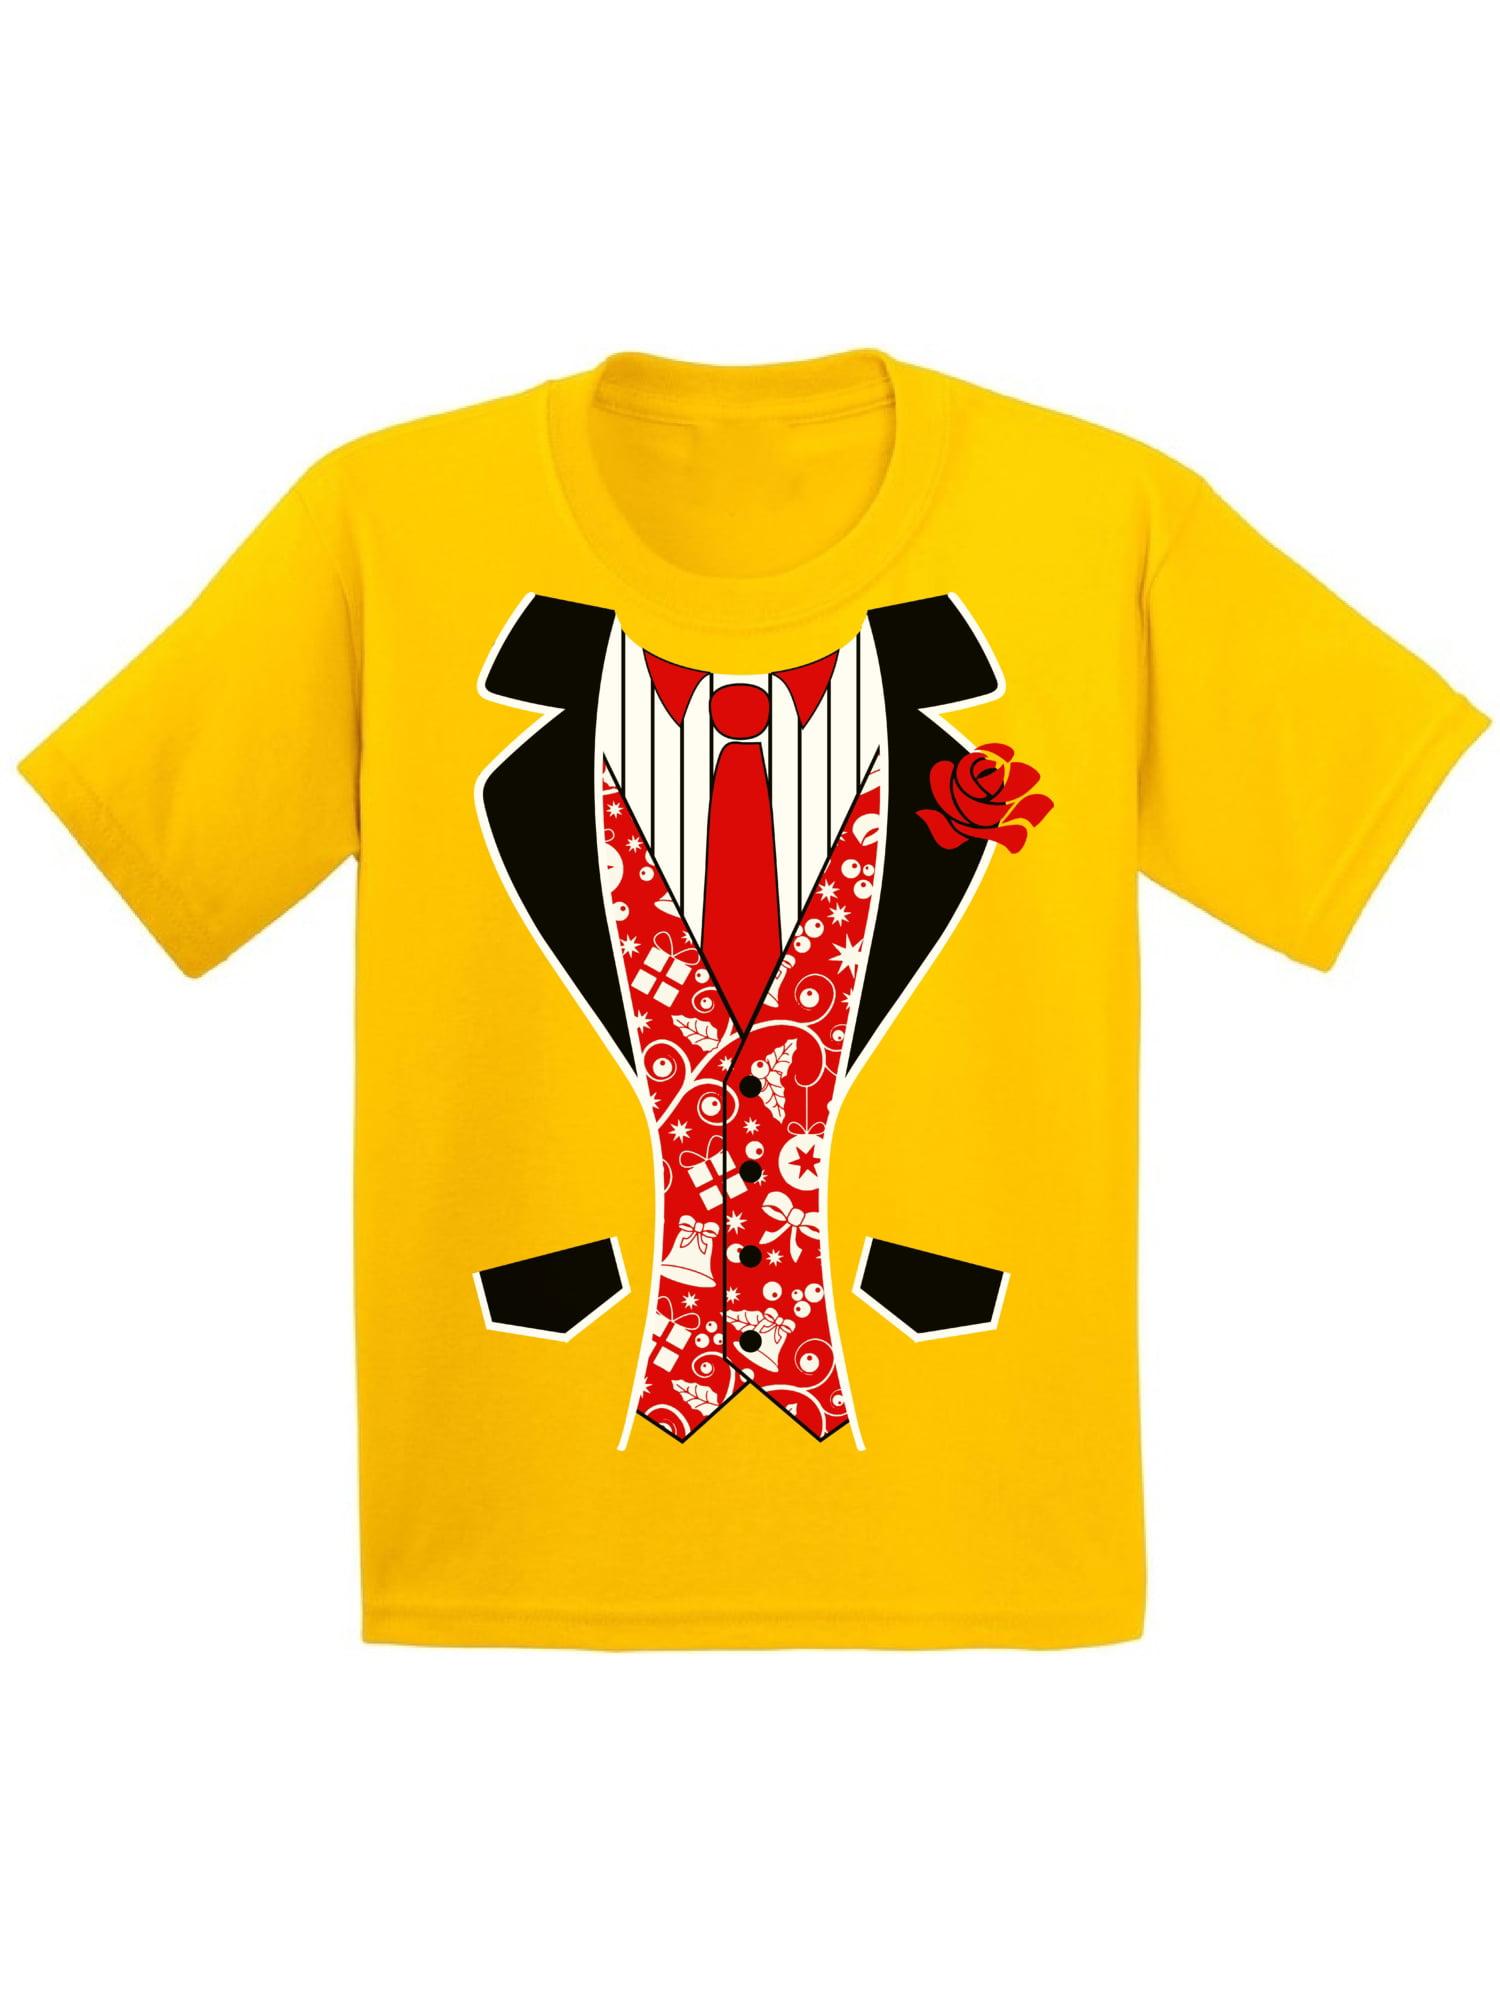 TUXEDO Xmas COSTUME Youth Tshirt Merry Christmas Gift Holidays Kids Shirt